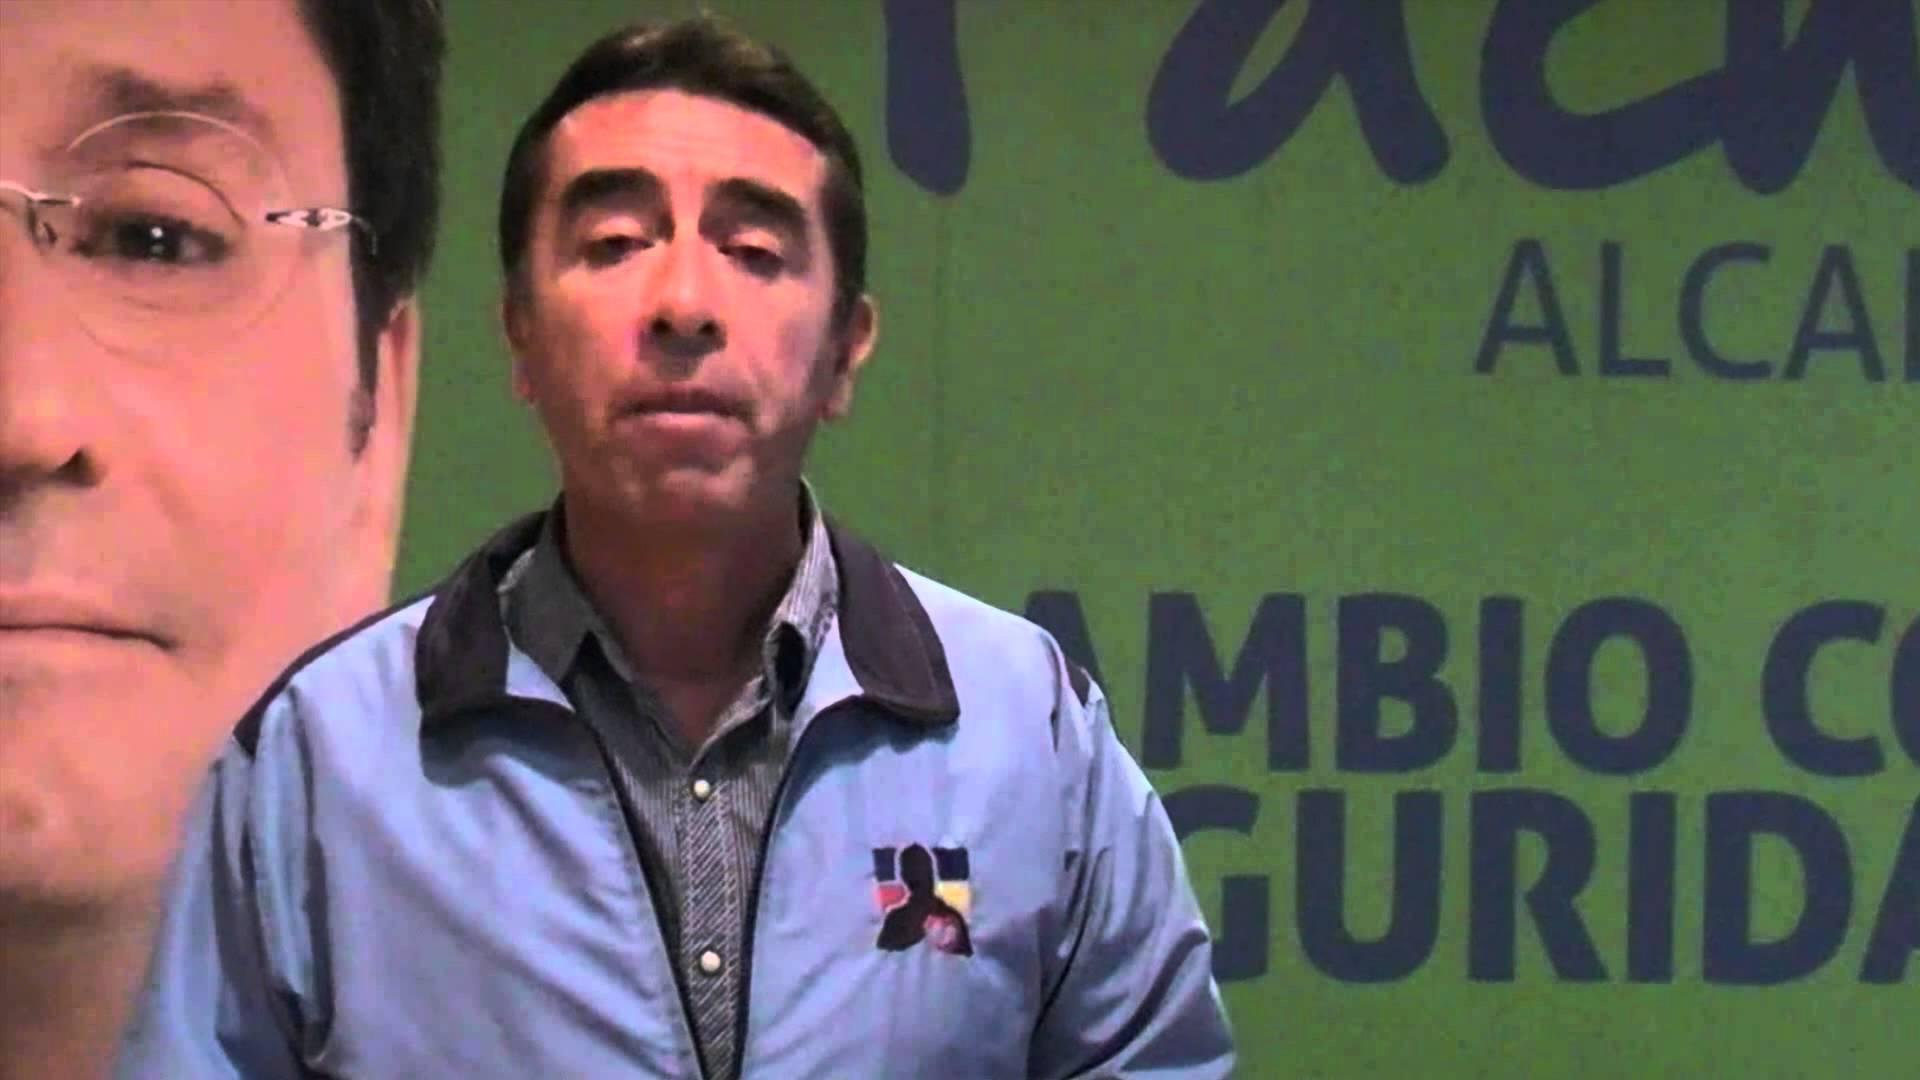 Javier Santiesteban posa al lado del candidato Pacho Santos